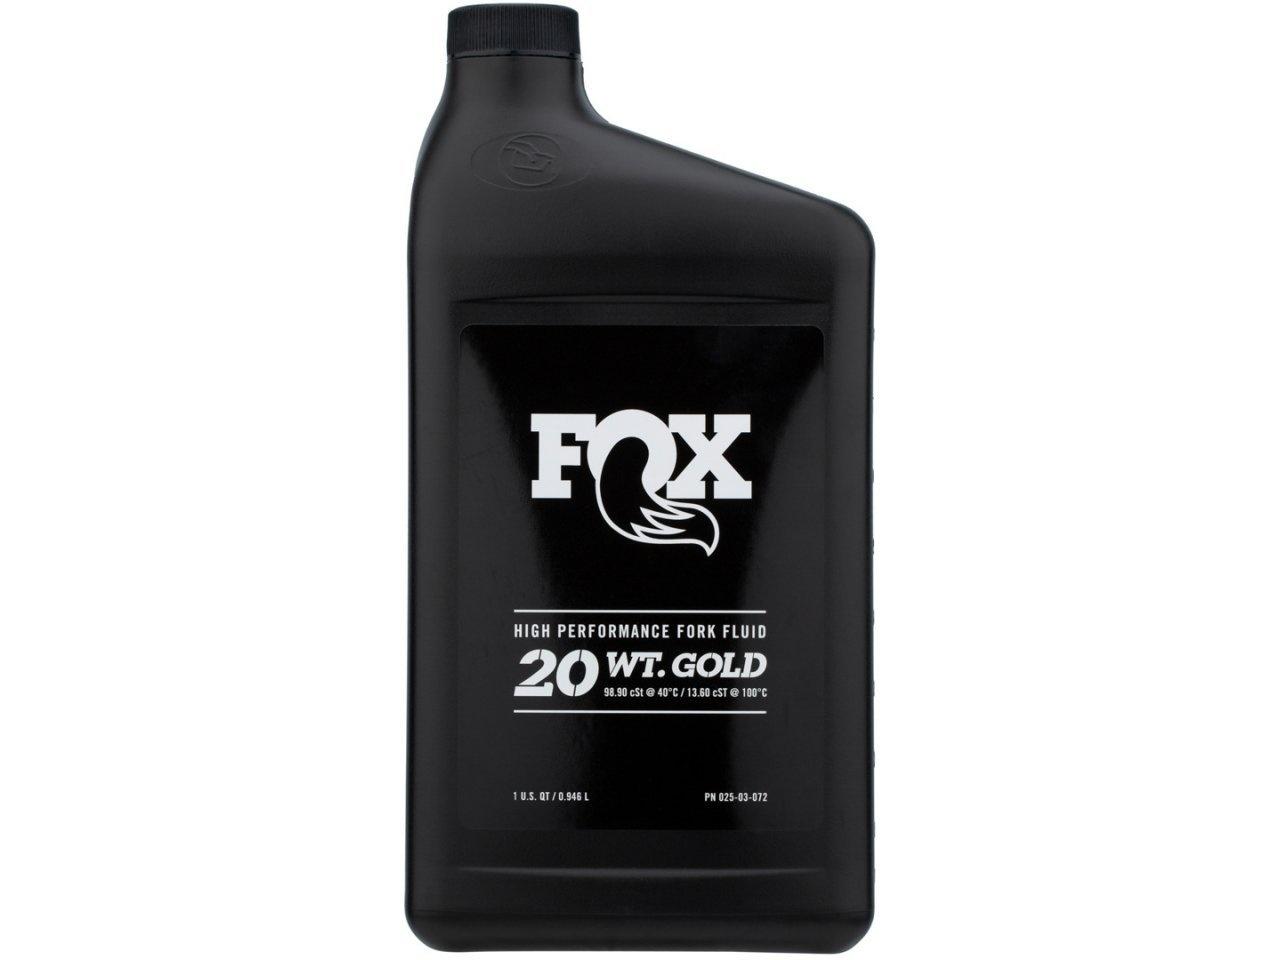 Fox High Performance Fork Fluid - 20 WT. Gold (32 oz)-1